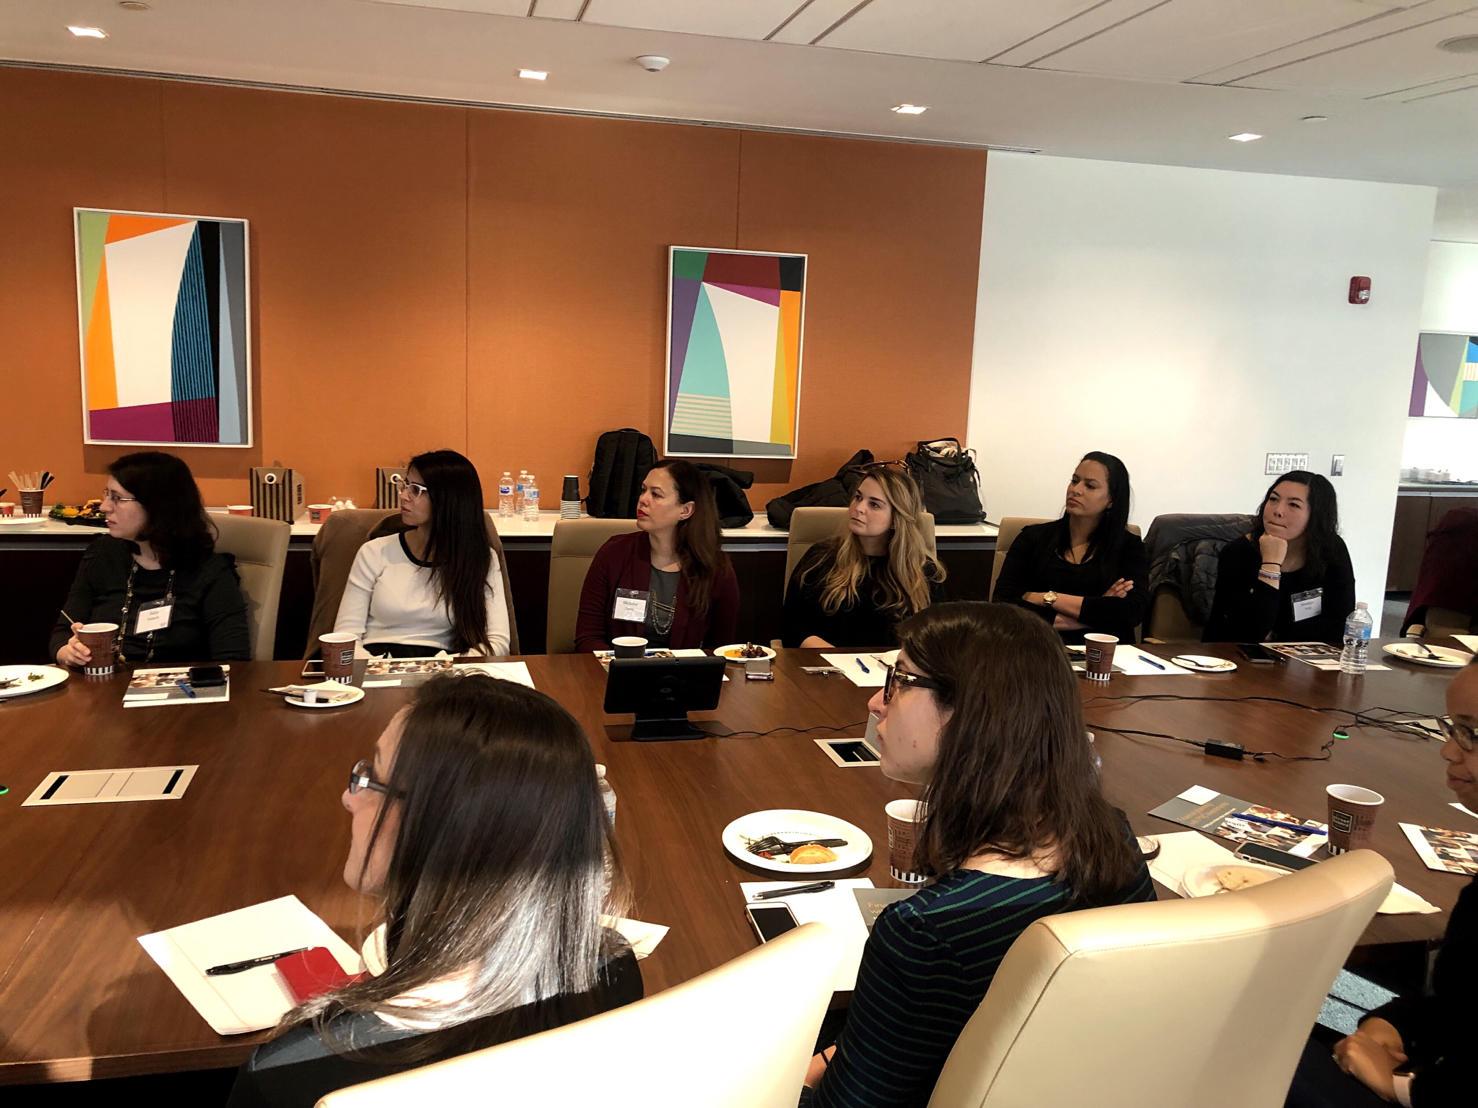 Cafecito Session #4-Women, Finances & Investing - Smart